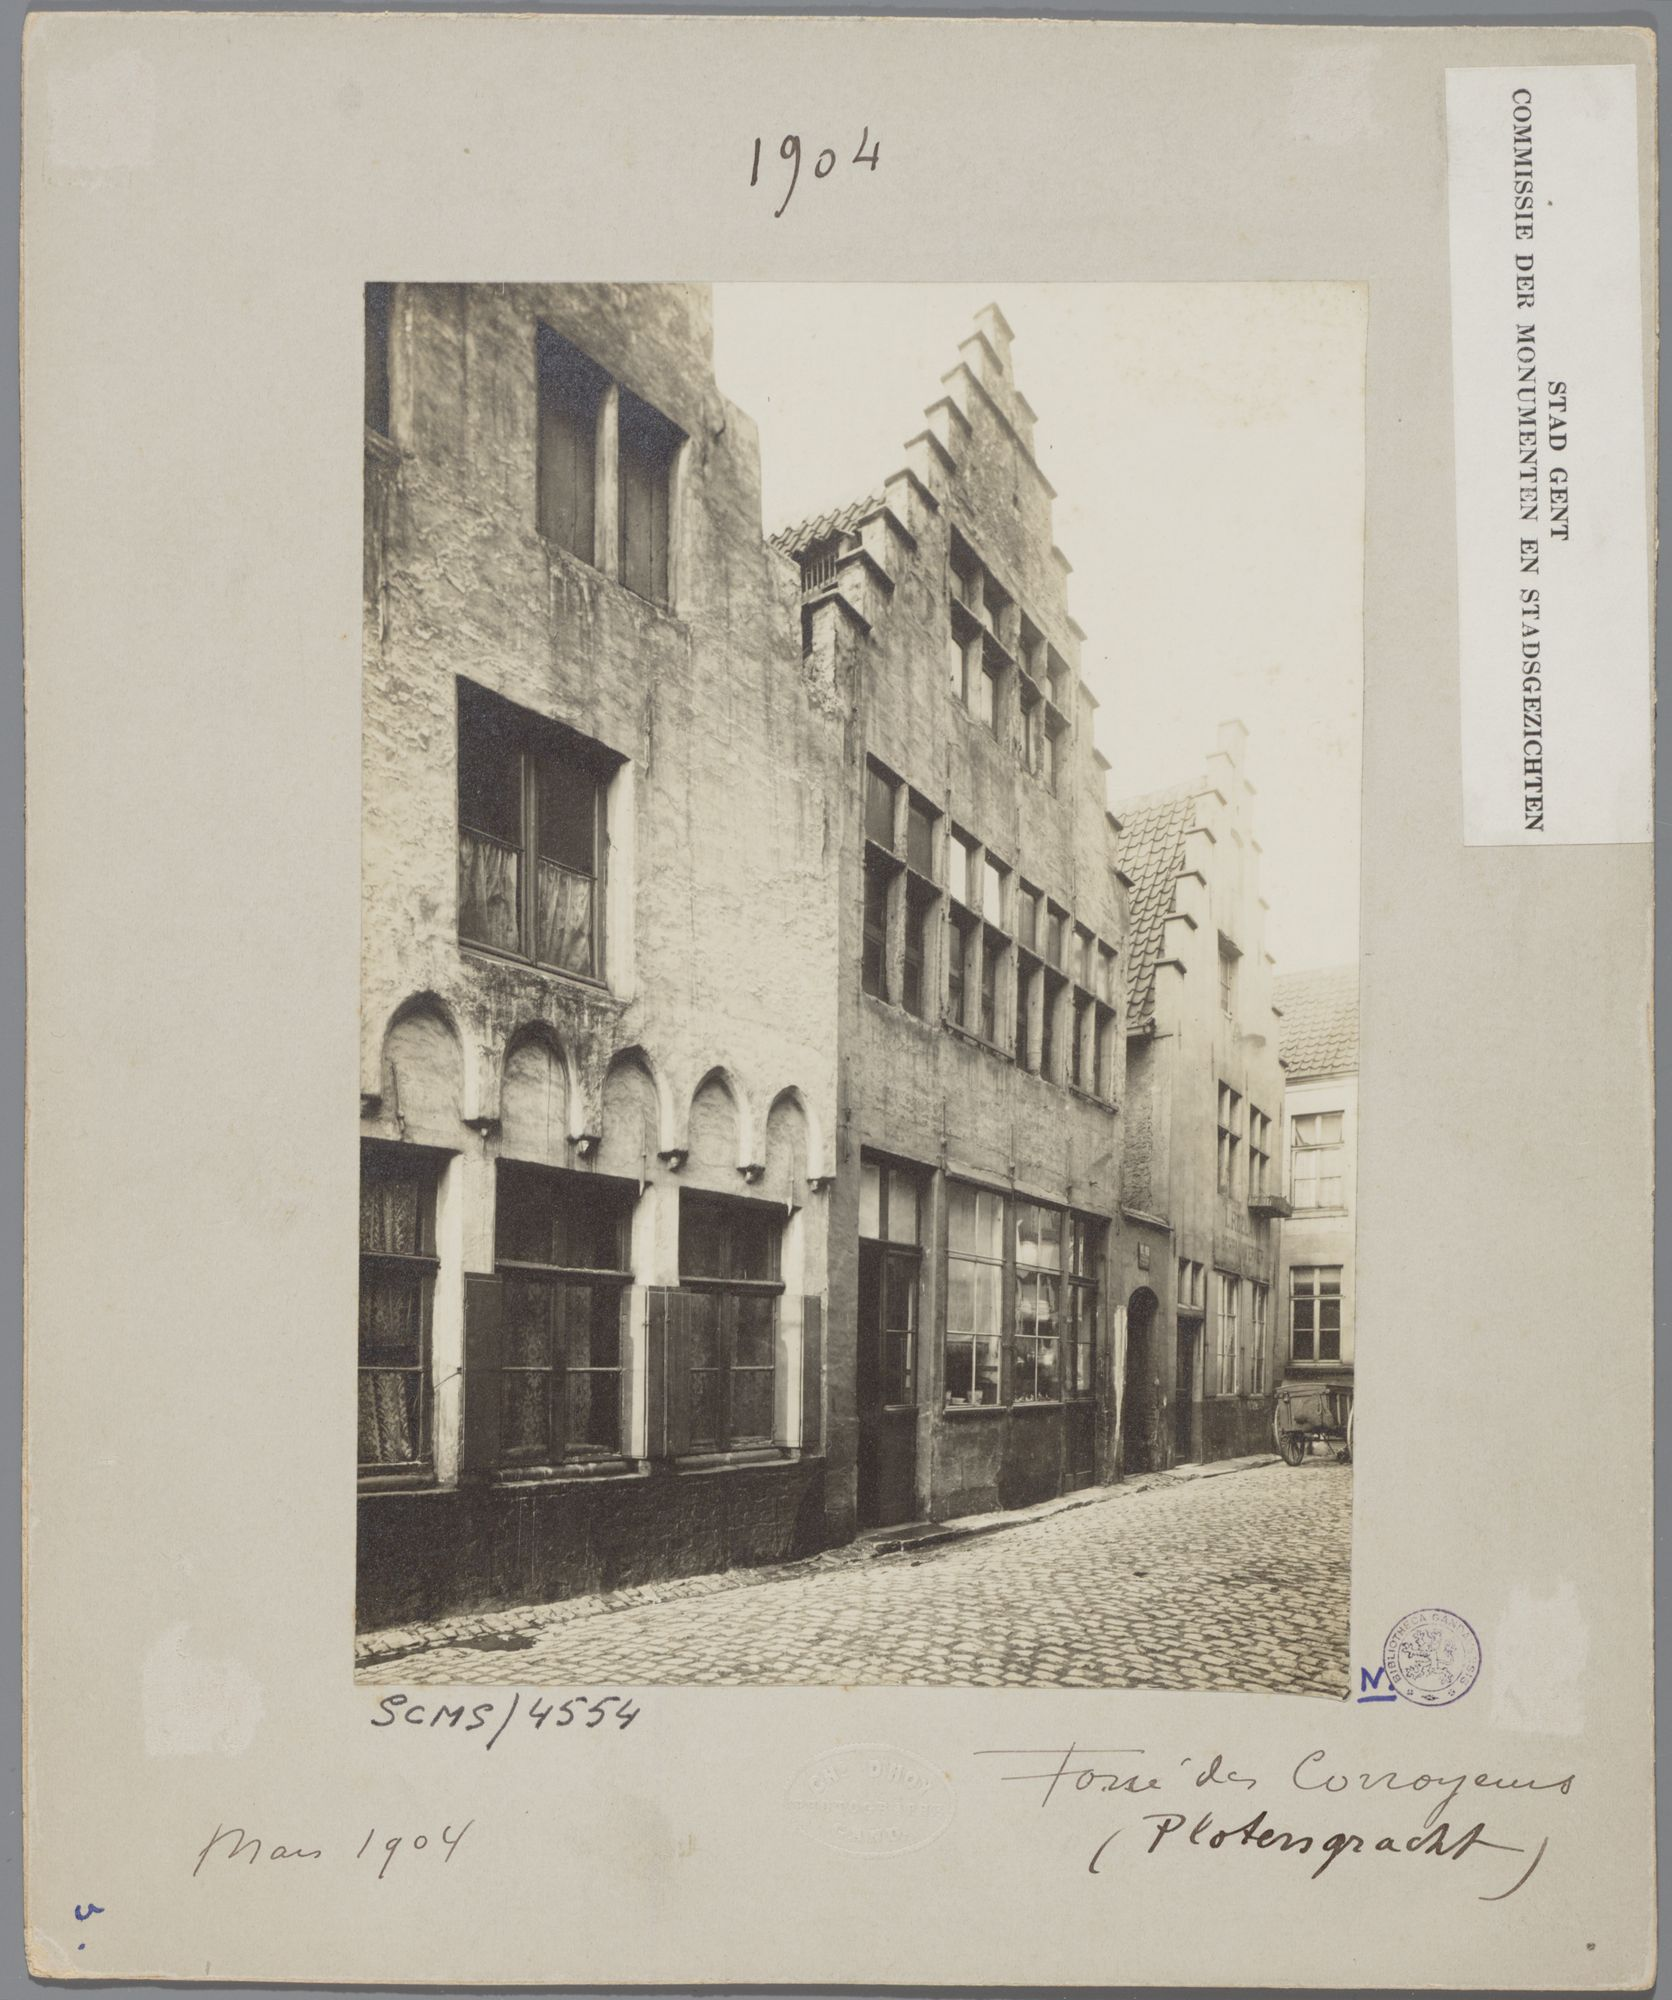 Gent: Trapgevelhuizen, Plotersgracht